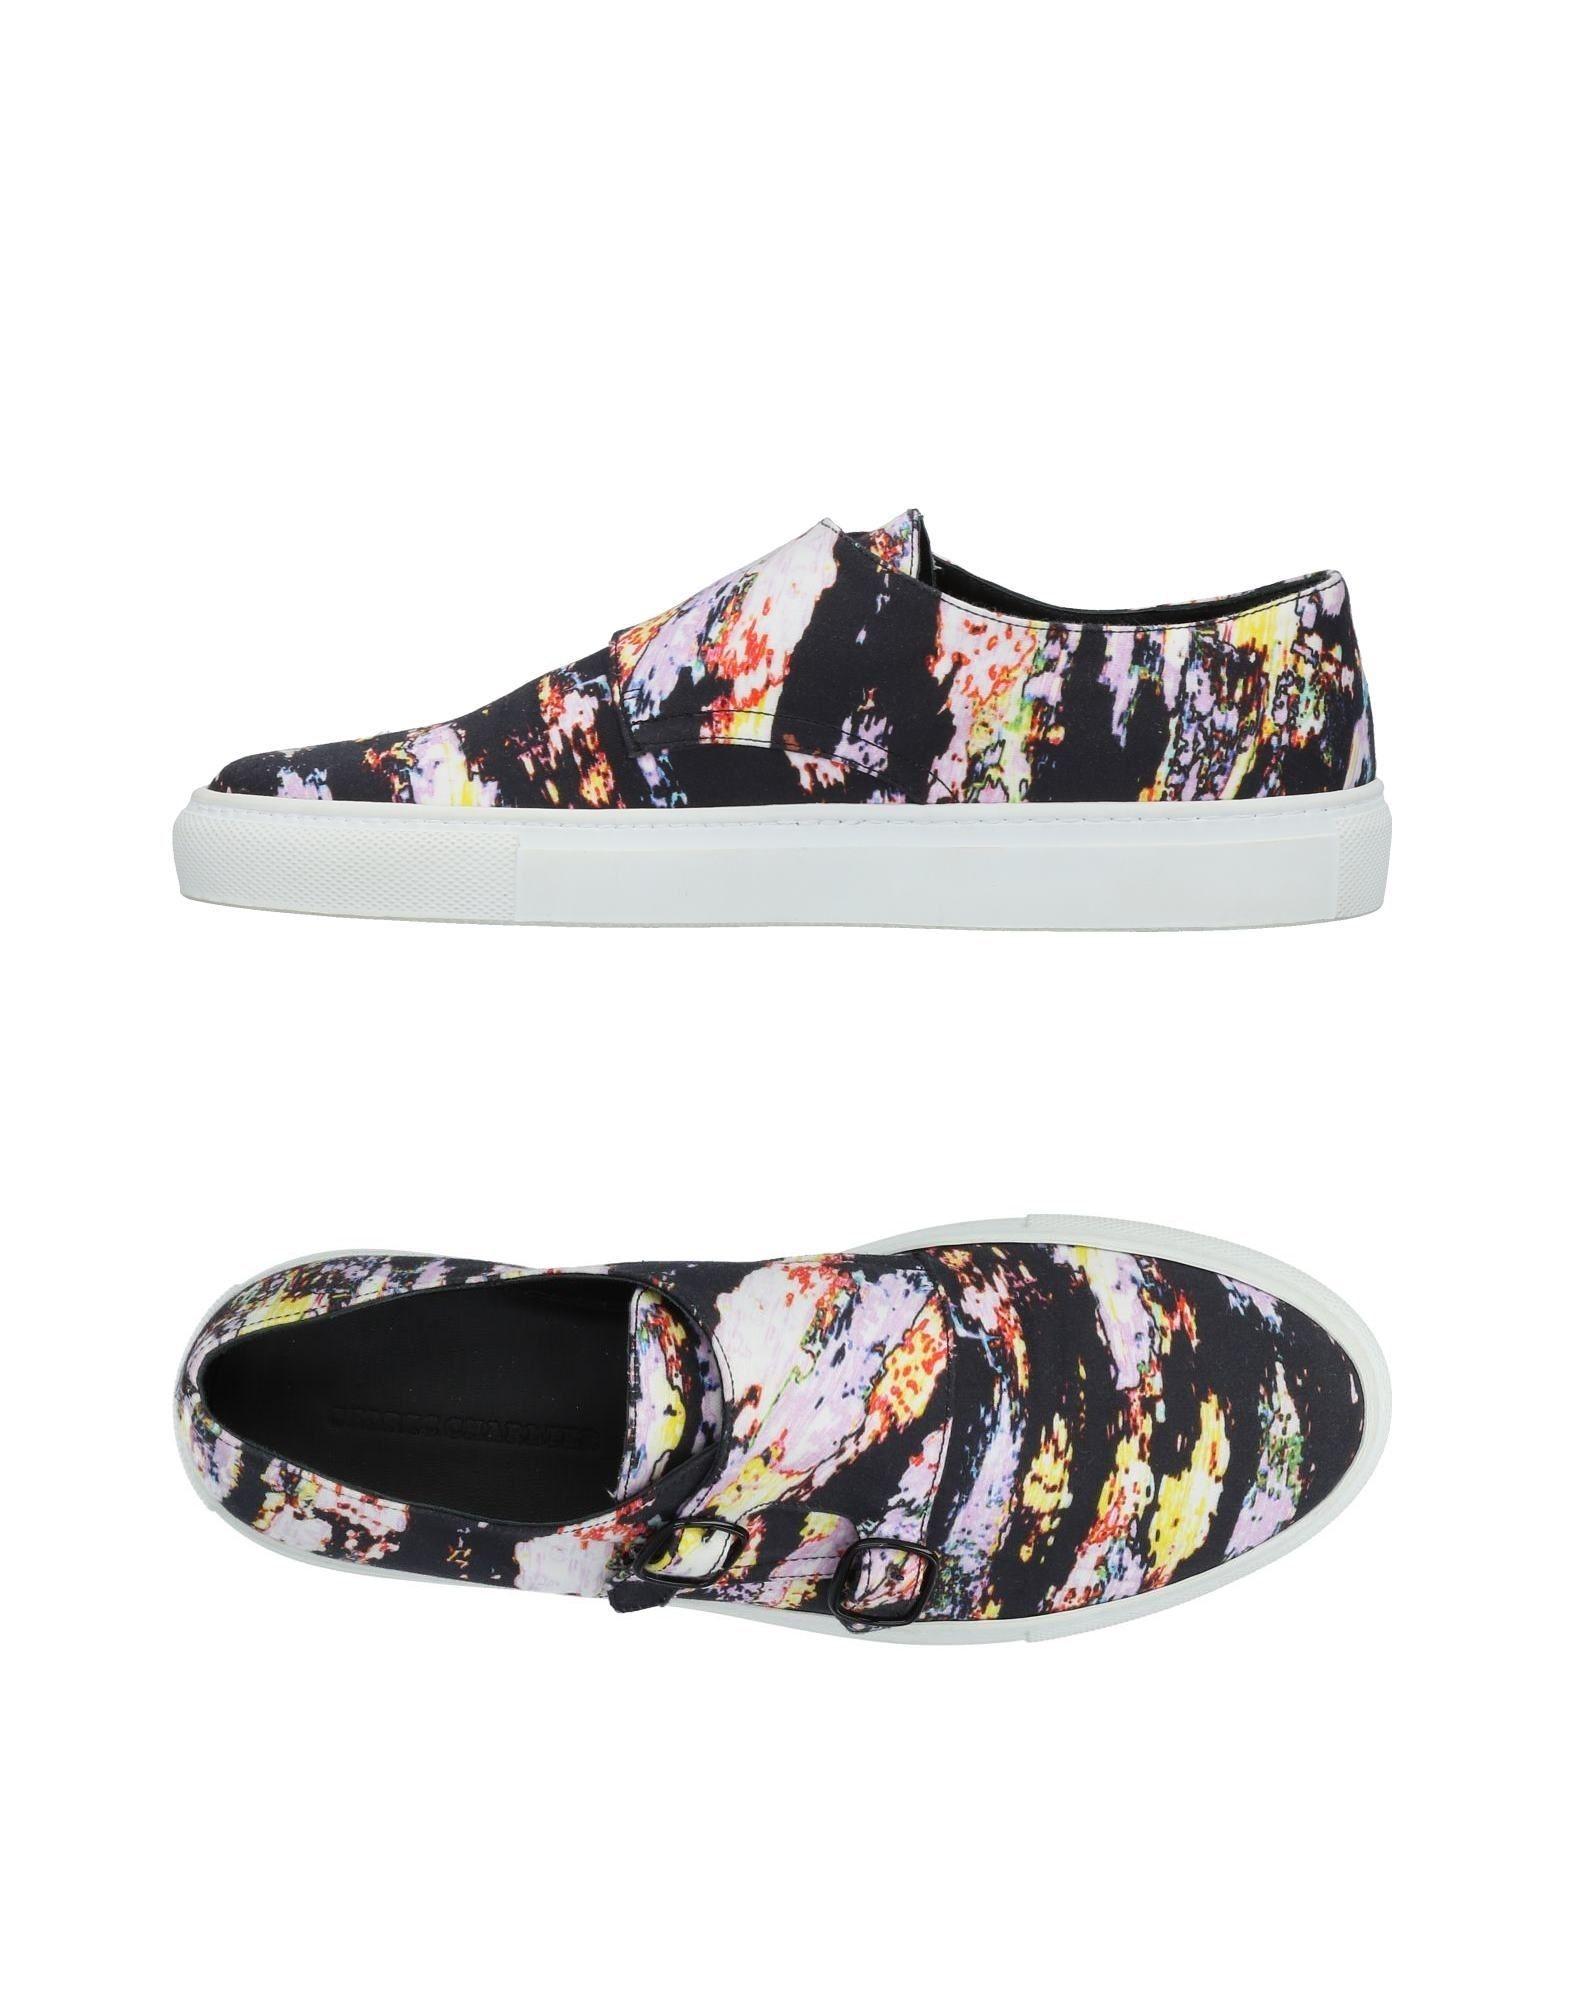 Gut billige um billige Gut Schuhe zu tragenCedric Charlier Sneakers Damen  11485711XN 31bd03